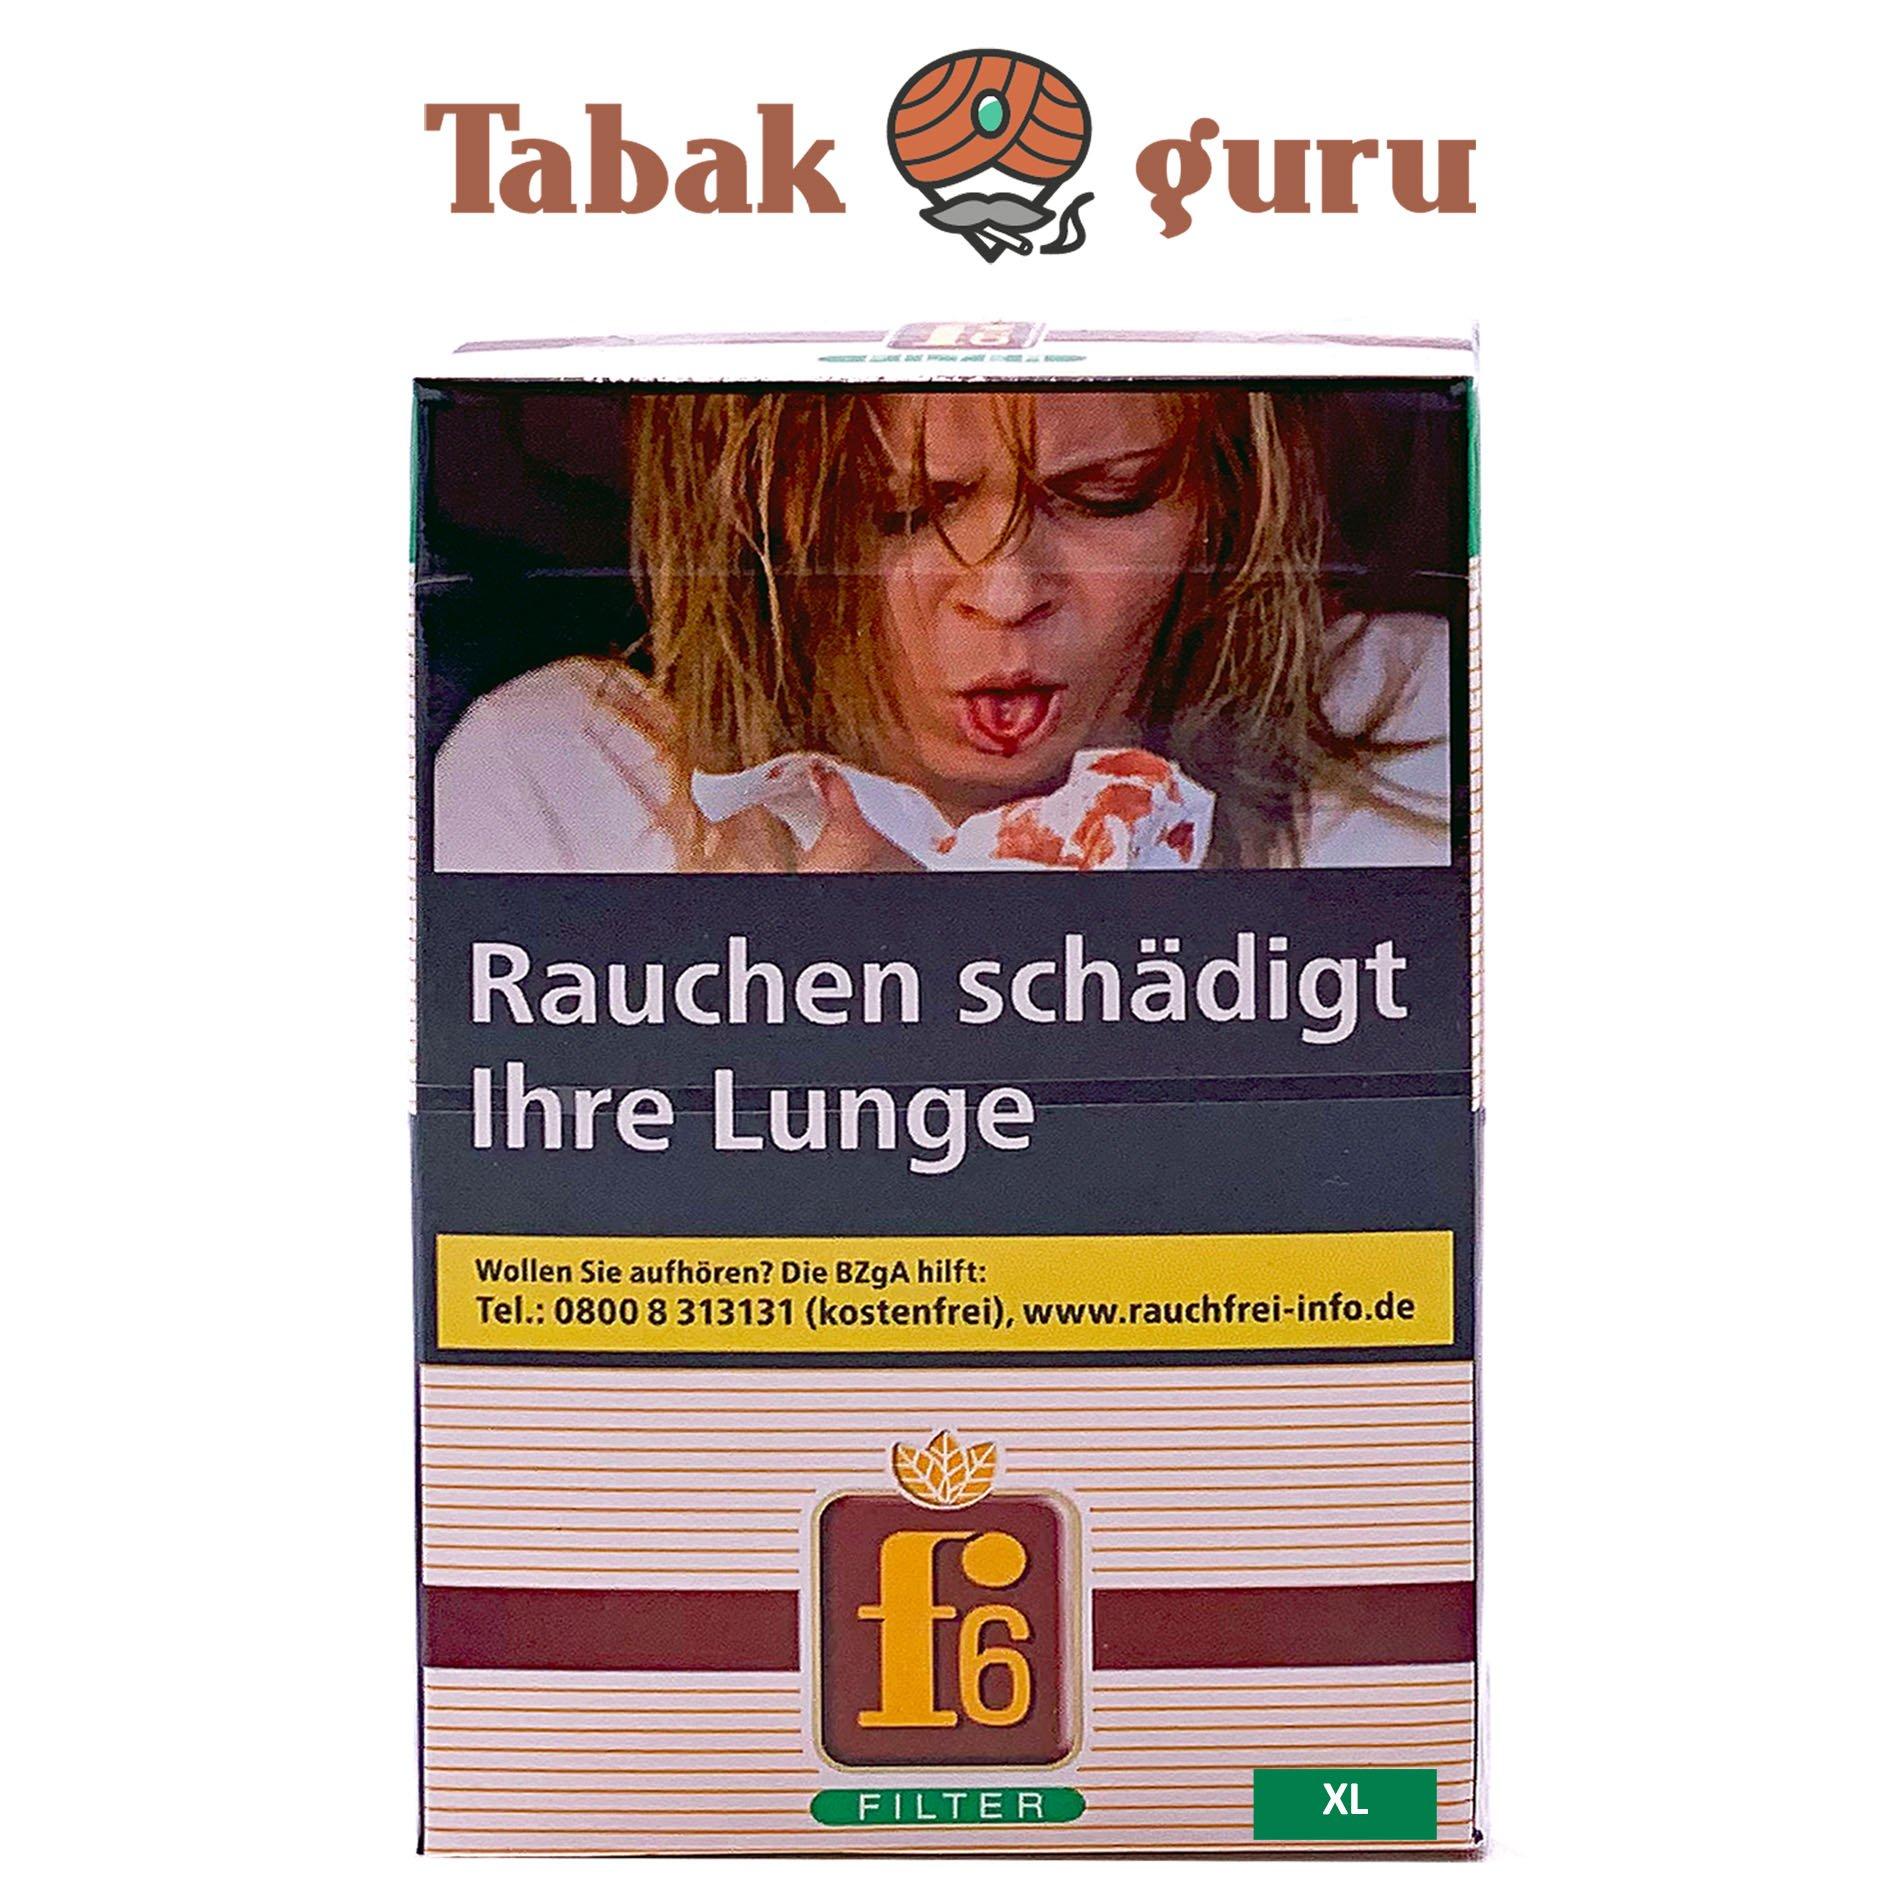 f6 Original Zigaretten XL Box